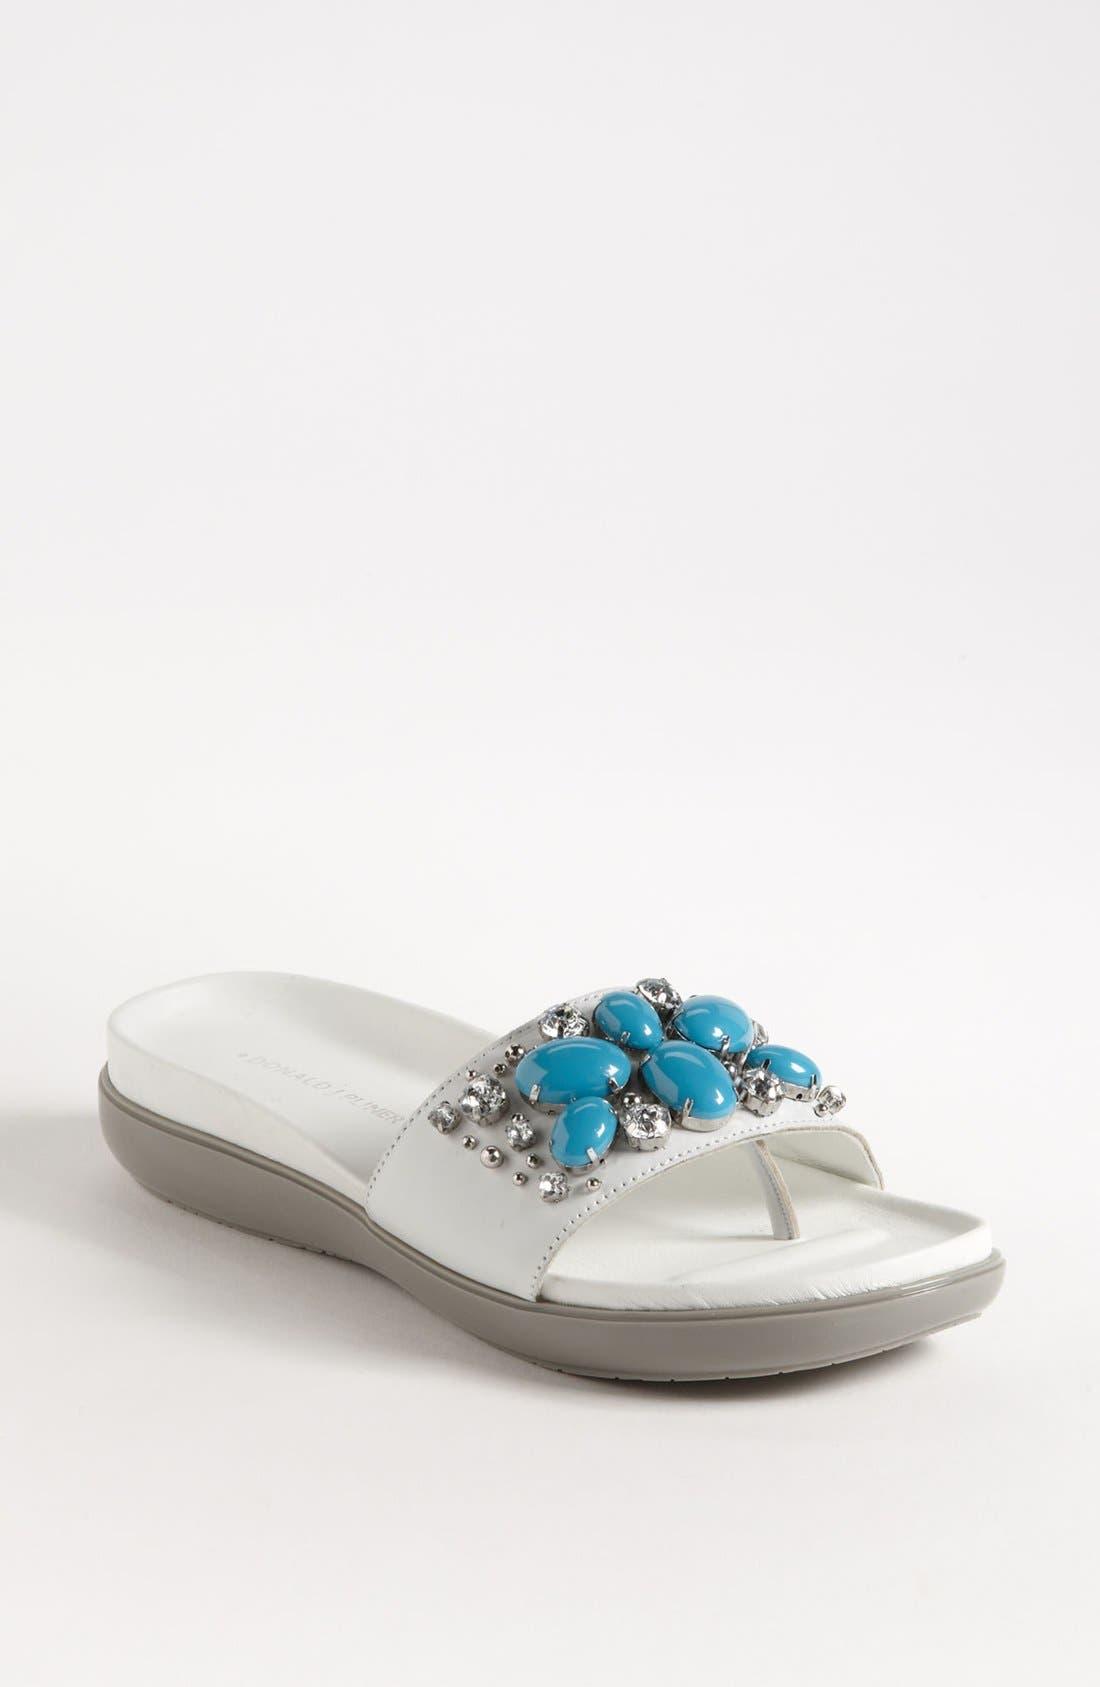 Main Image - Donald J Pliner 'Holly' Sandal